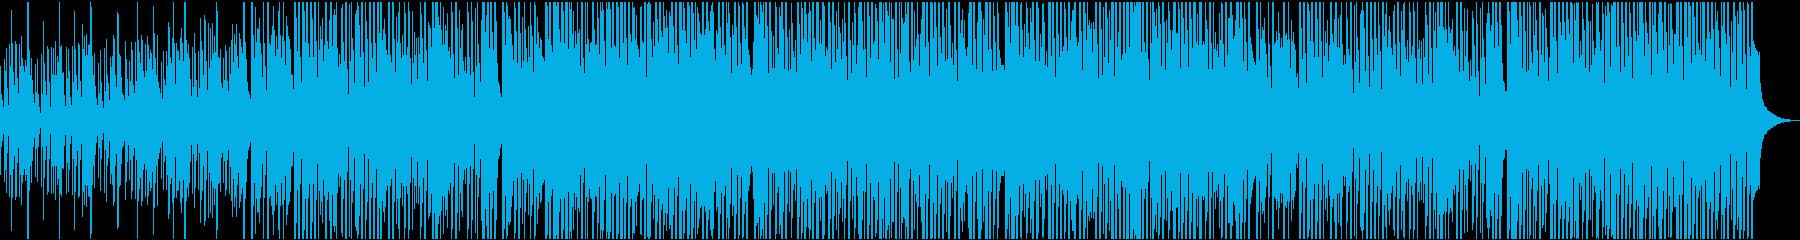 Little Joyの再生済みの波形